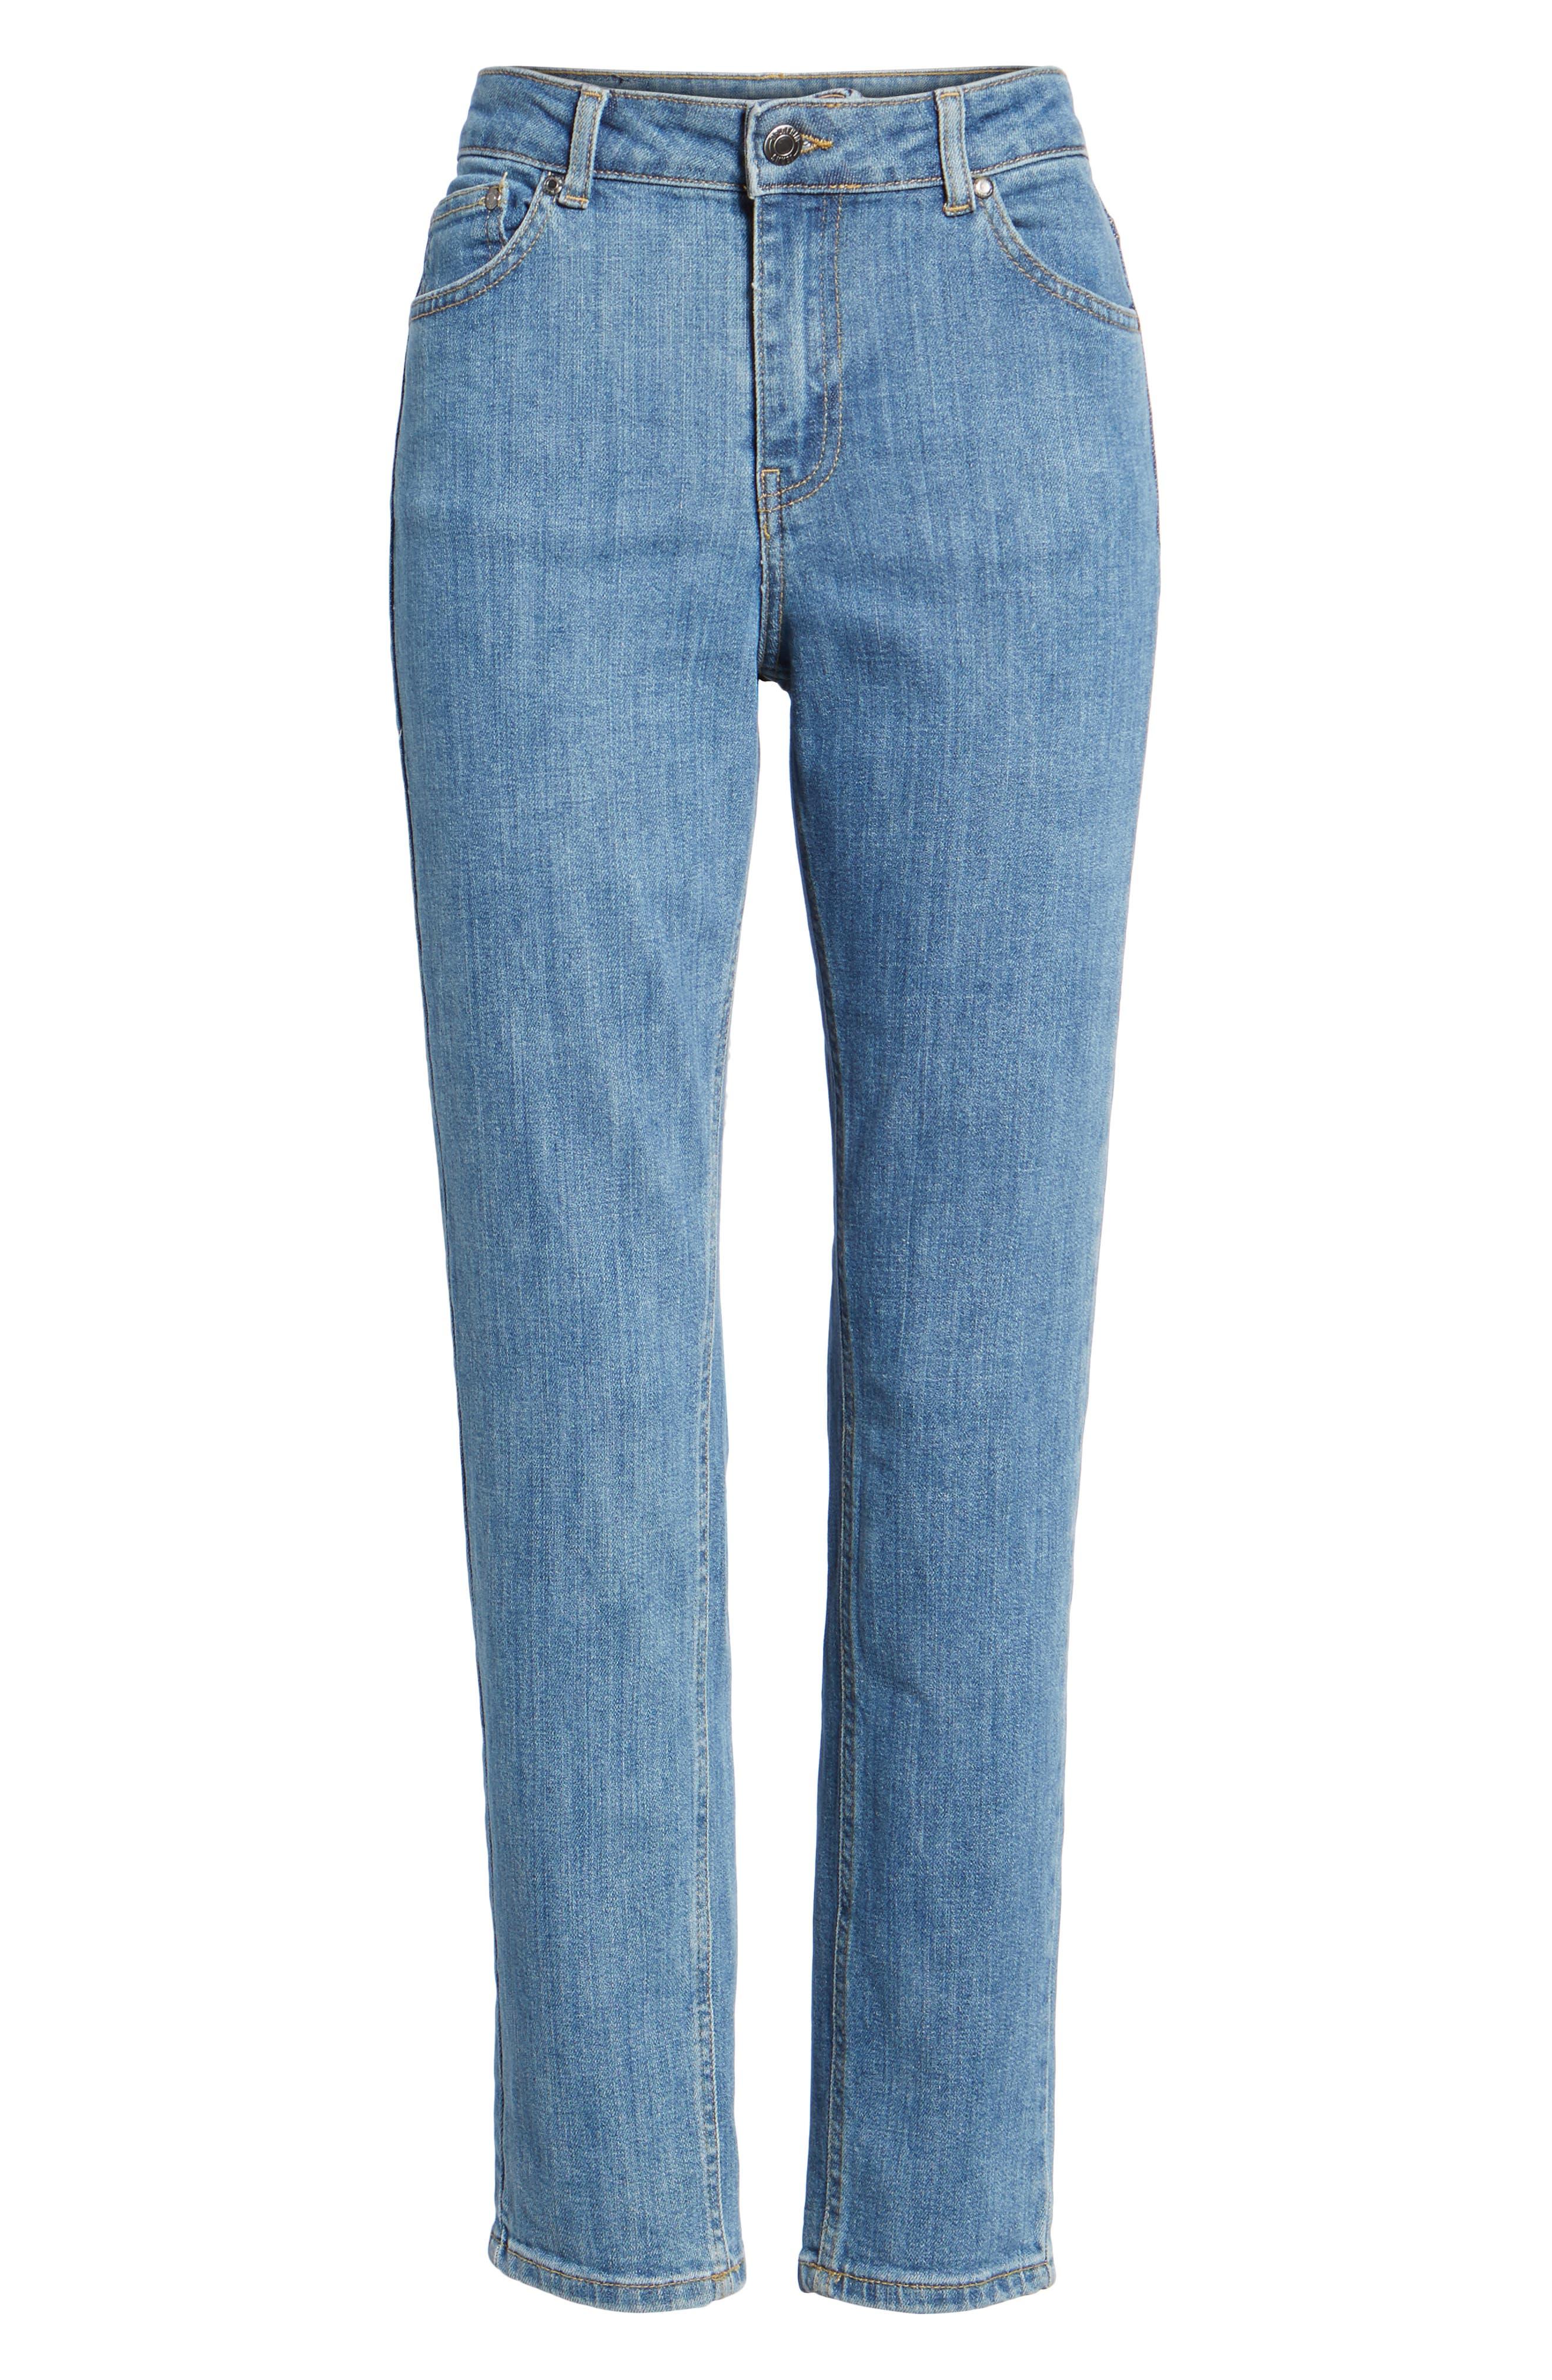 Edie High Waist Crop Jeans,                             Alternate thumbnail 7, color,                             400